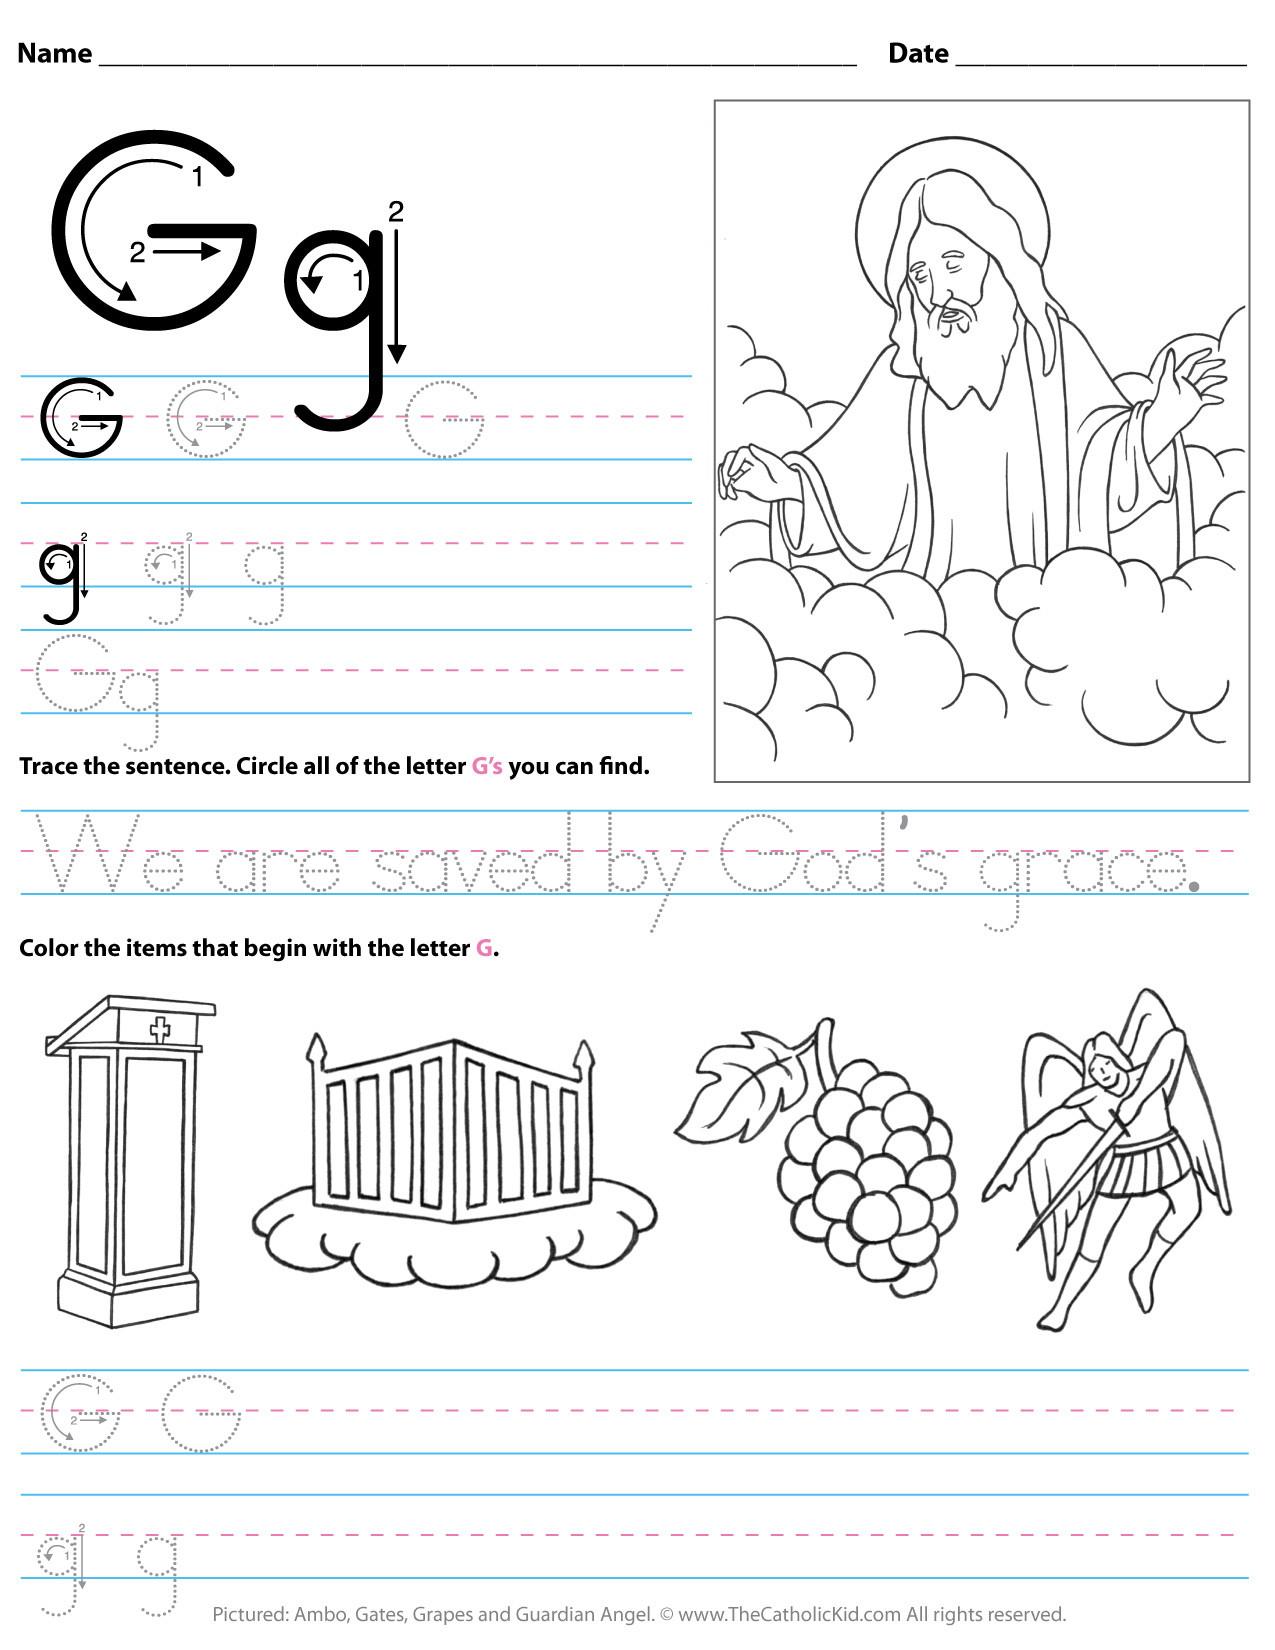 Letter G Worksheets for Kindergarten Catholic Alphabet Letter G Worksheet Preschool Kindergarten